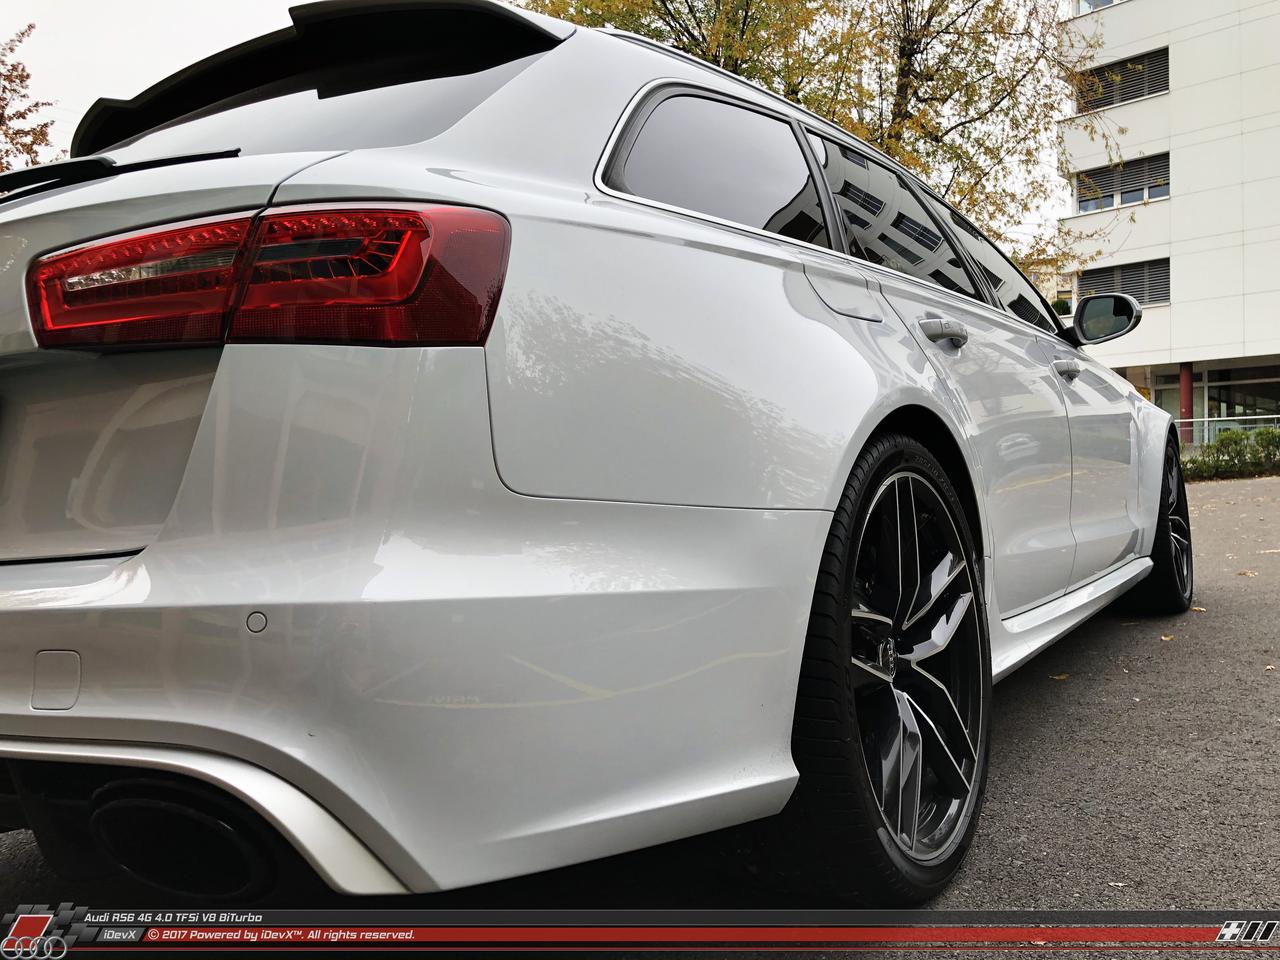 10_11.2018_Audi-RS6_iDevX_032.png